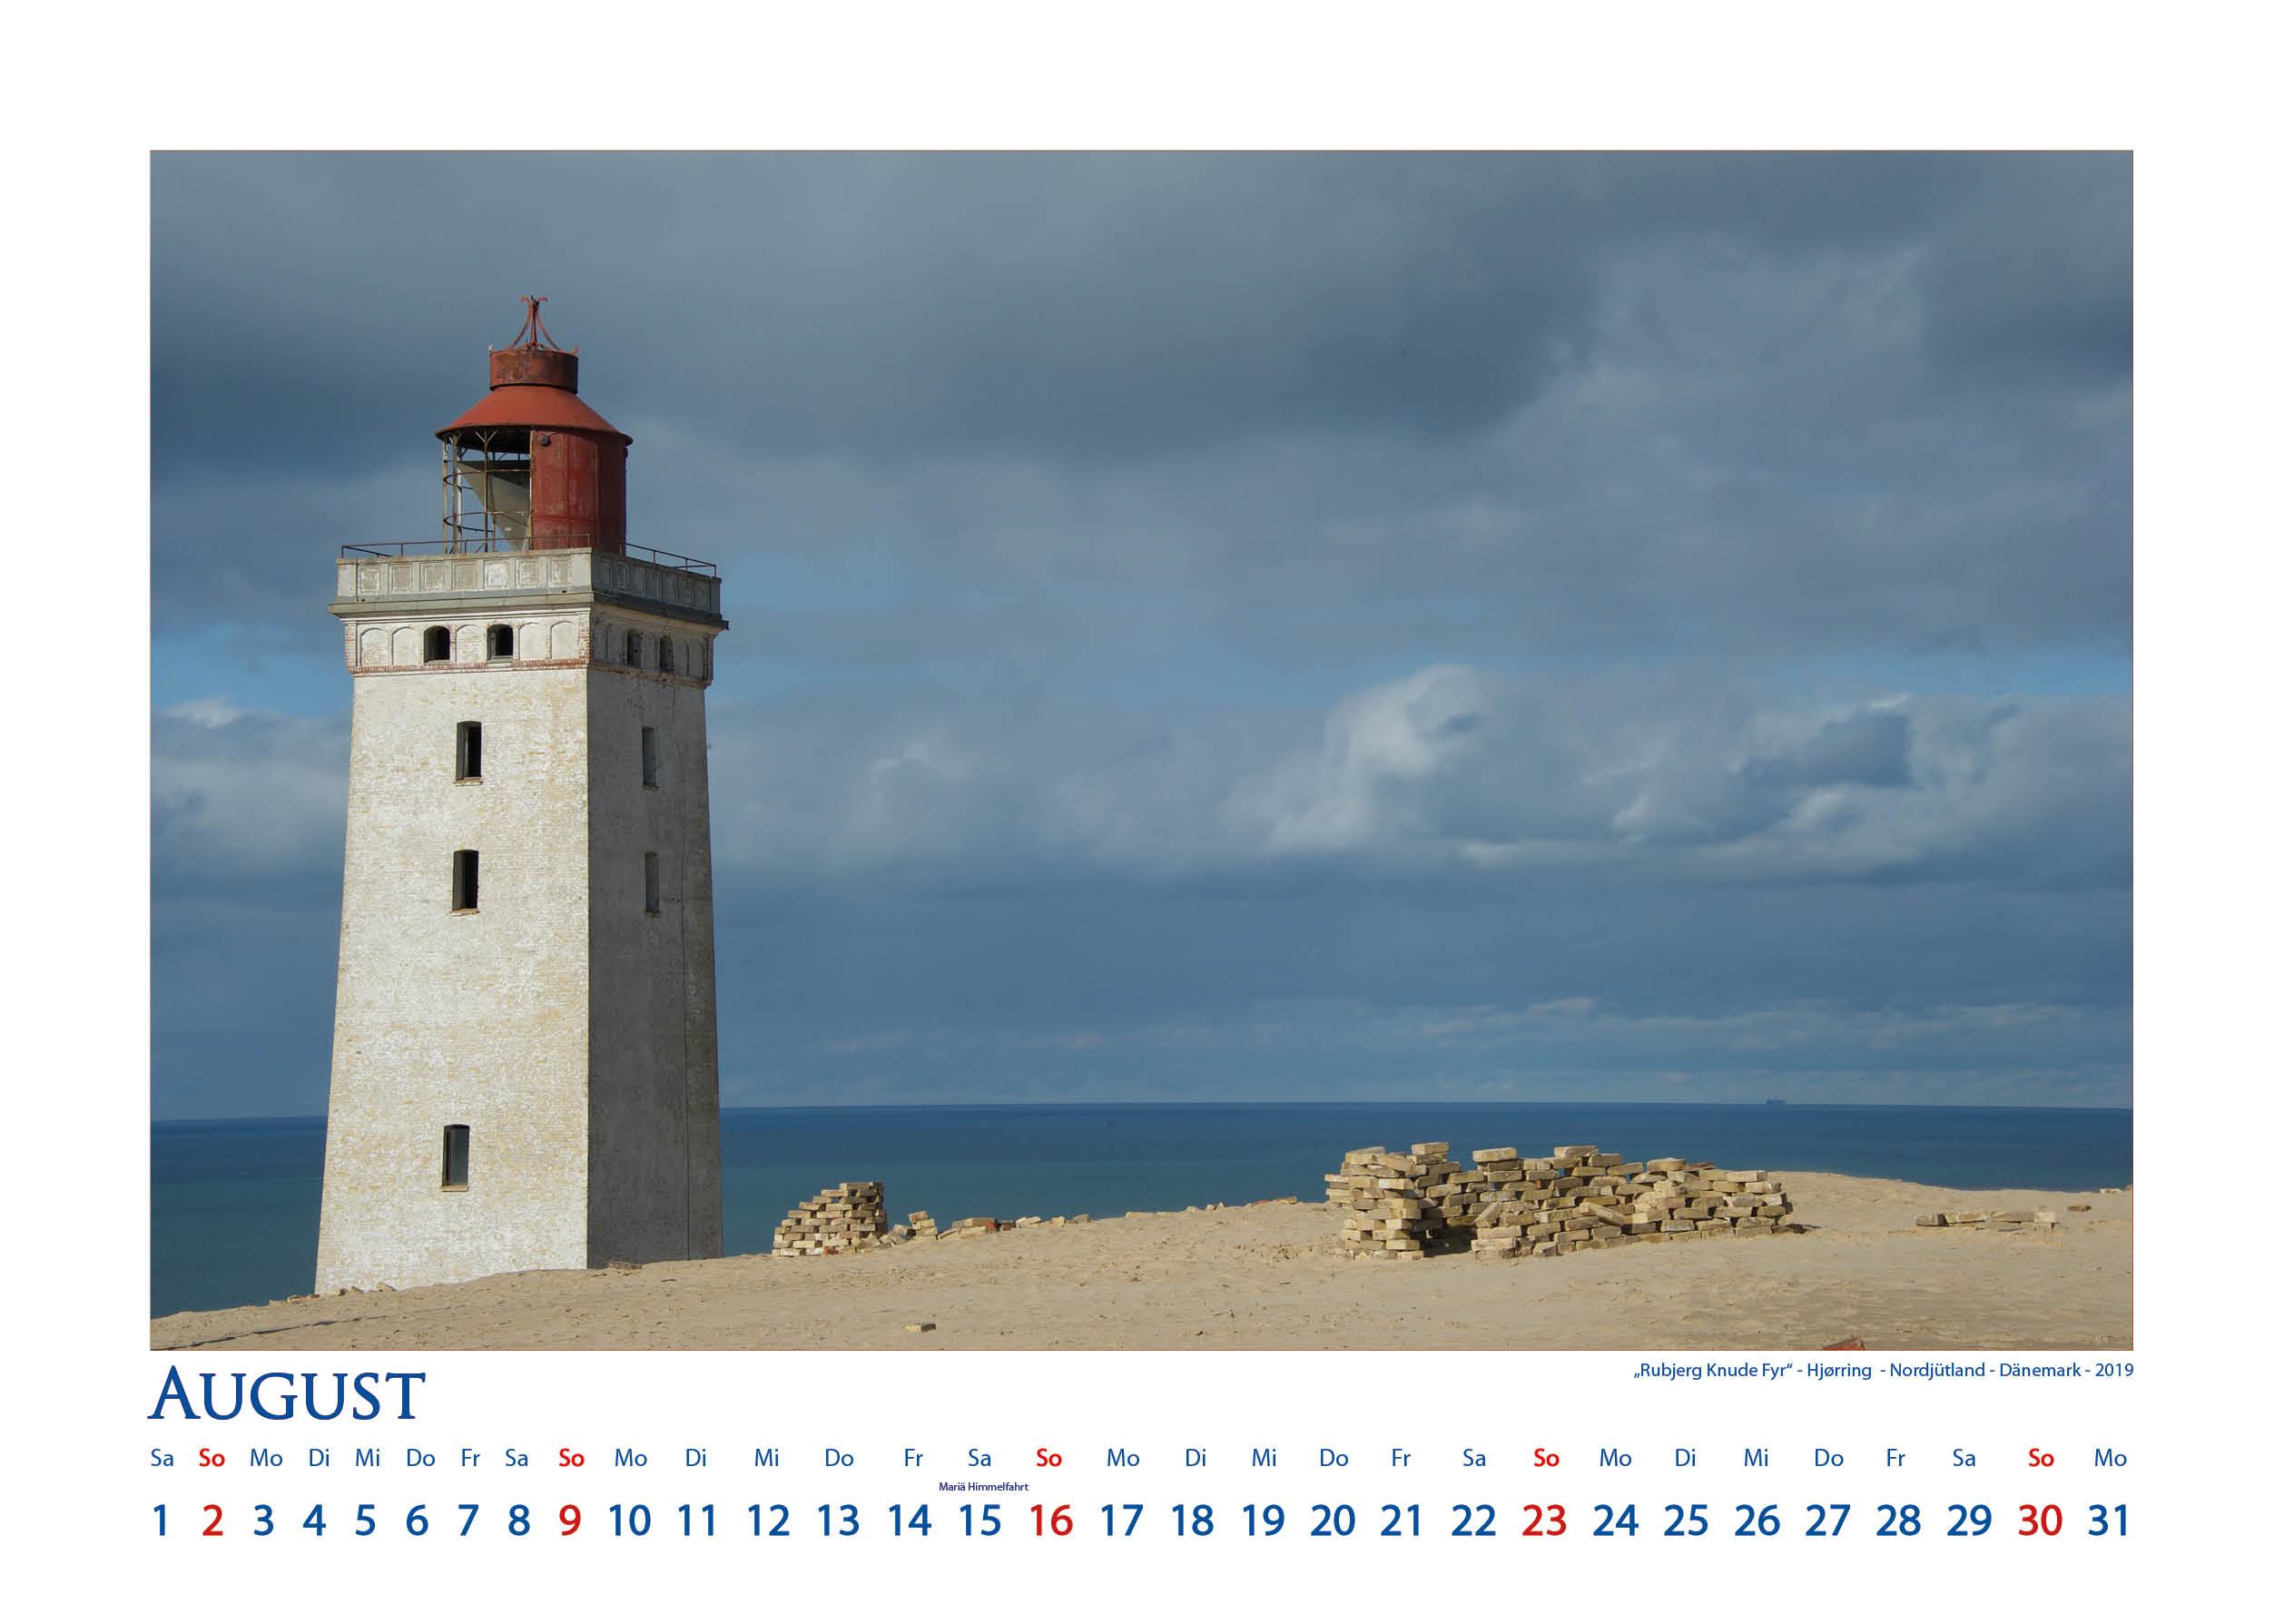 Rubjerg Fyr - Leuchttürme - Kalender 2020 © Katharina Hansen-Gluschitz